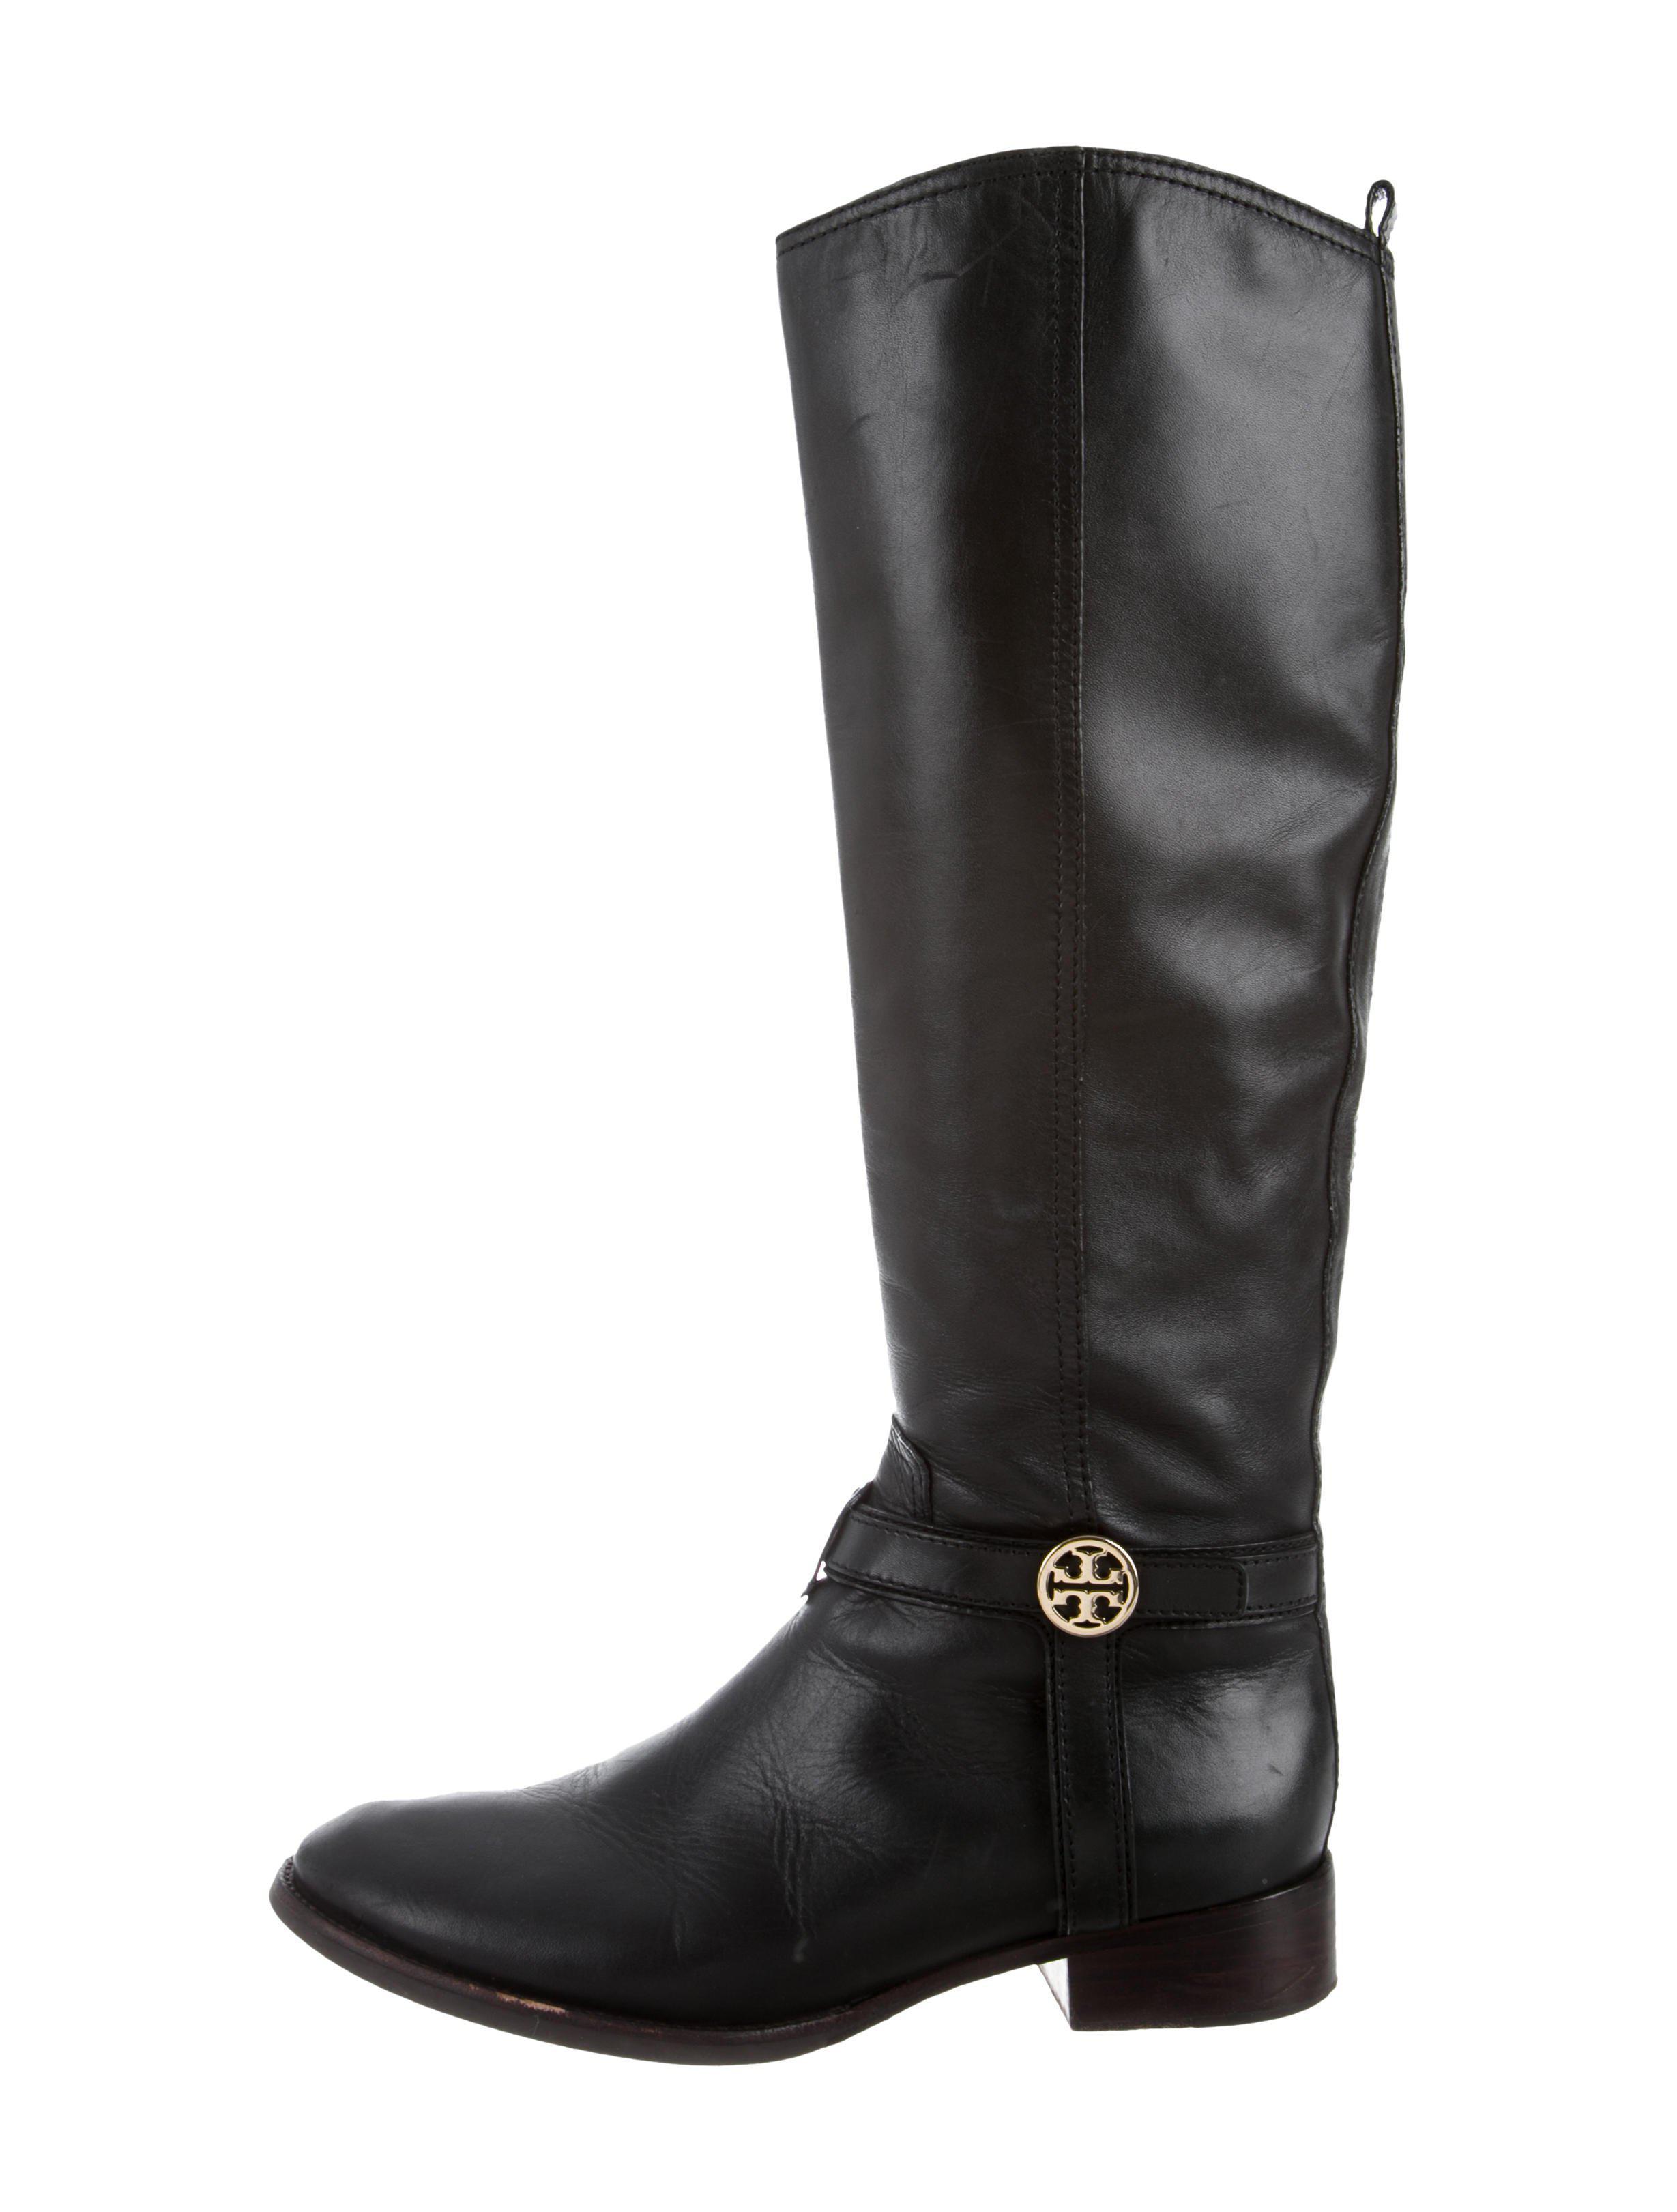 772ac25c6441a Lyst - Tory Burch Round-toe Logo Knee-high Boots Black in Metallic